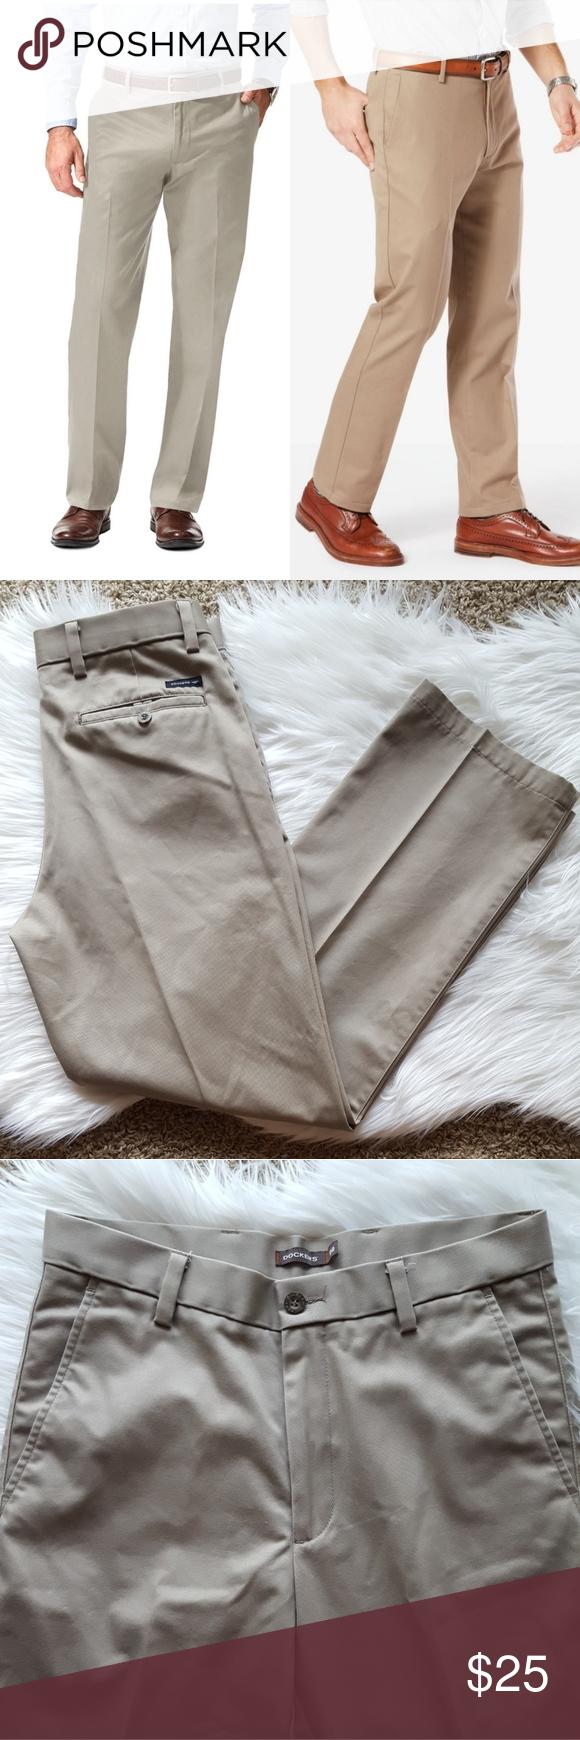 Left Photo Dockers D2 Pants Straight Leg Pants D2 Fit Pants From Dockers I Believe The Color Is Cloud Left In Clothes Design Fashion Design Dockers Pants